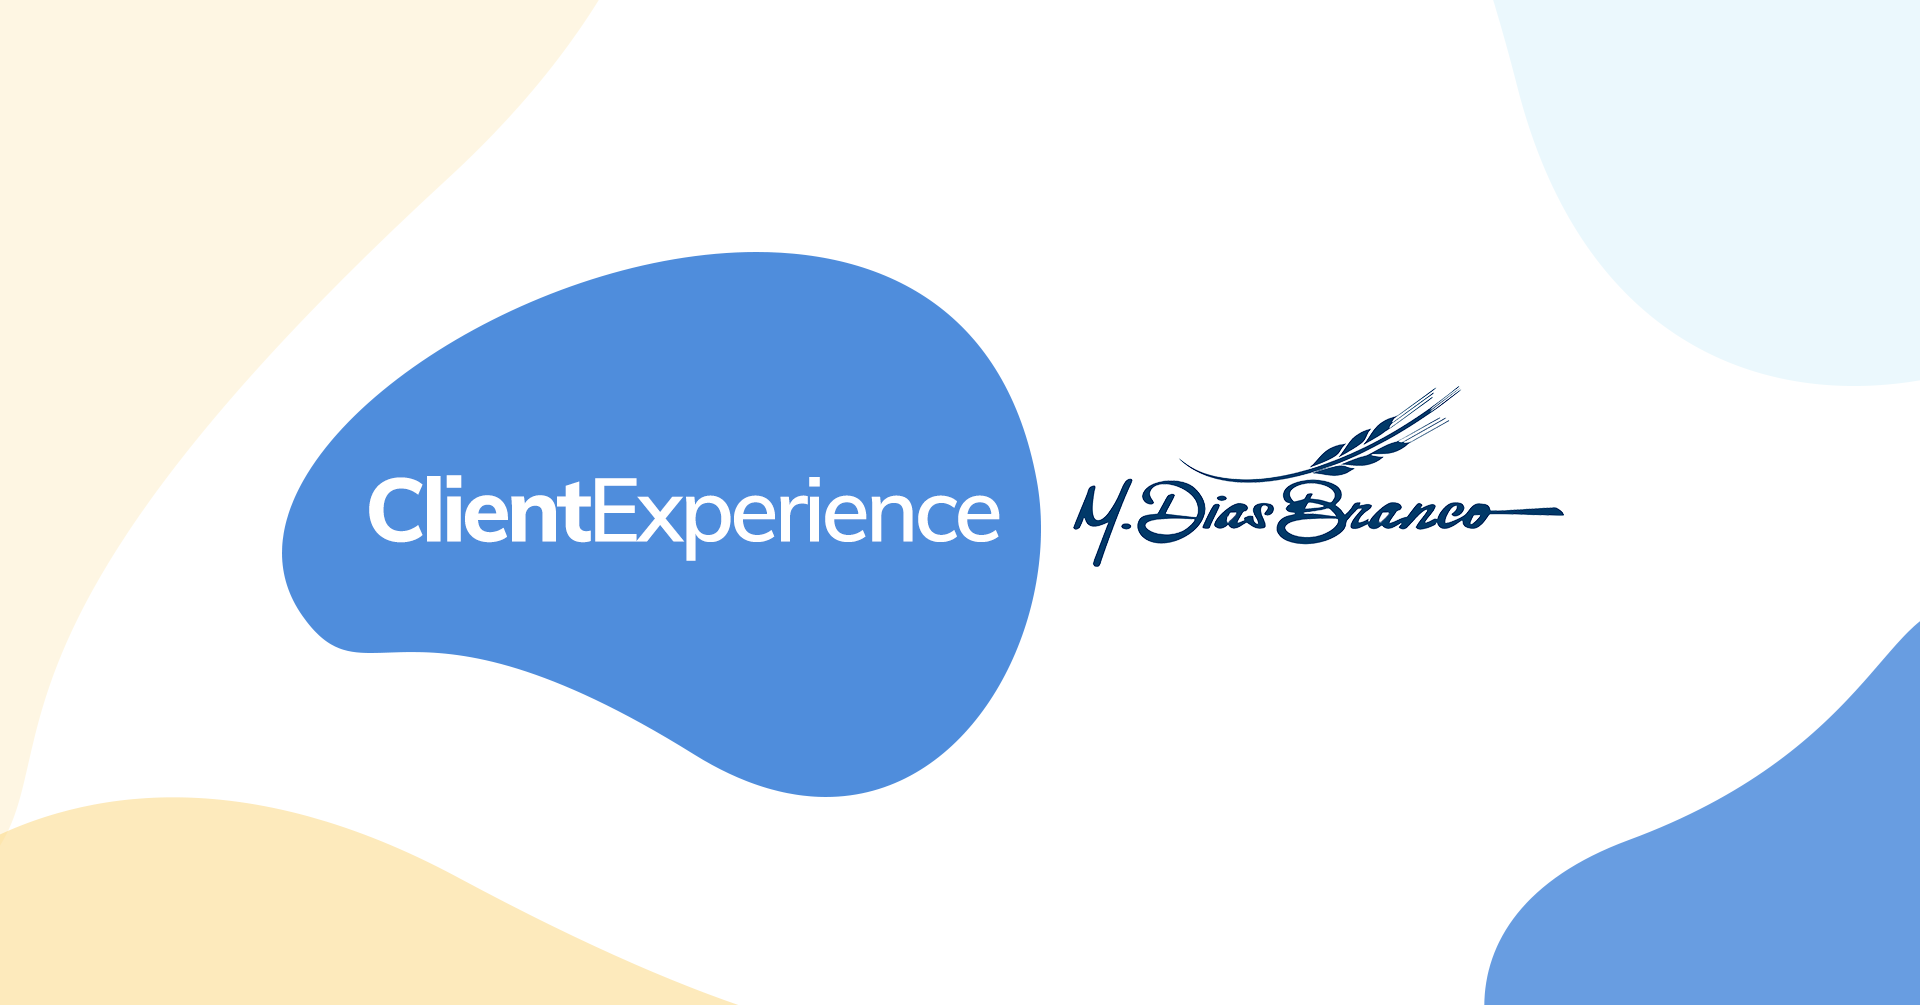 Client Experience: M. Dias Branco - Alimentos Fortaleza